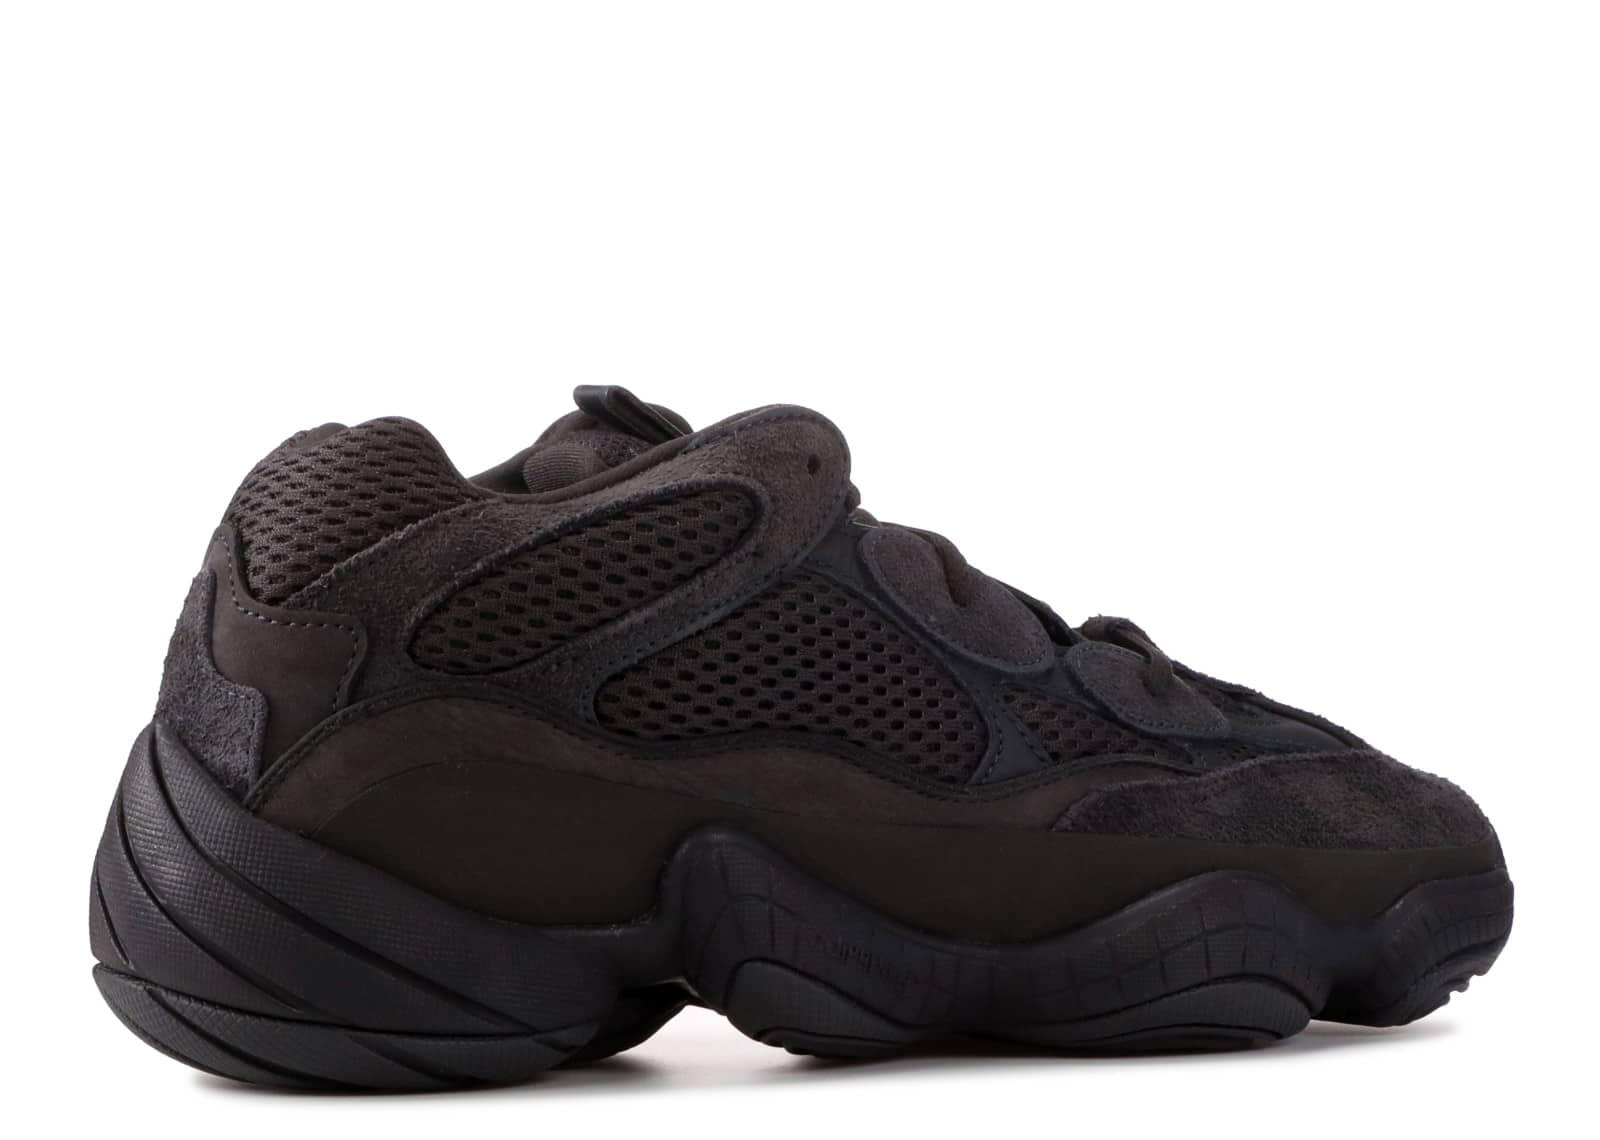 sale retailer af708 e6ab4 Adidas Yeezy 500 Utility Black - kickstw